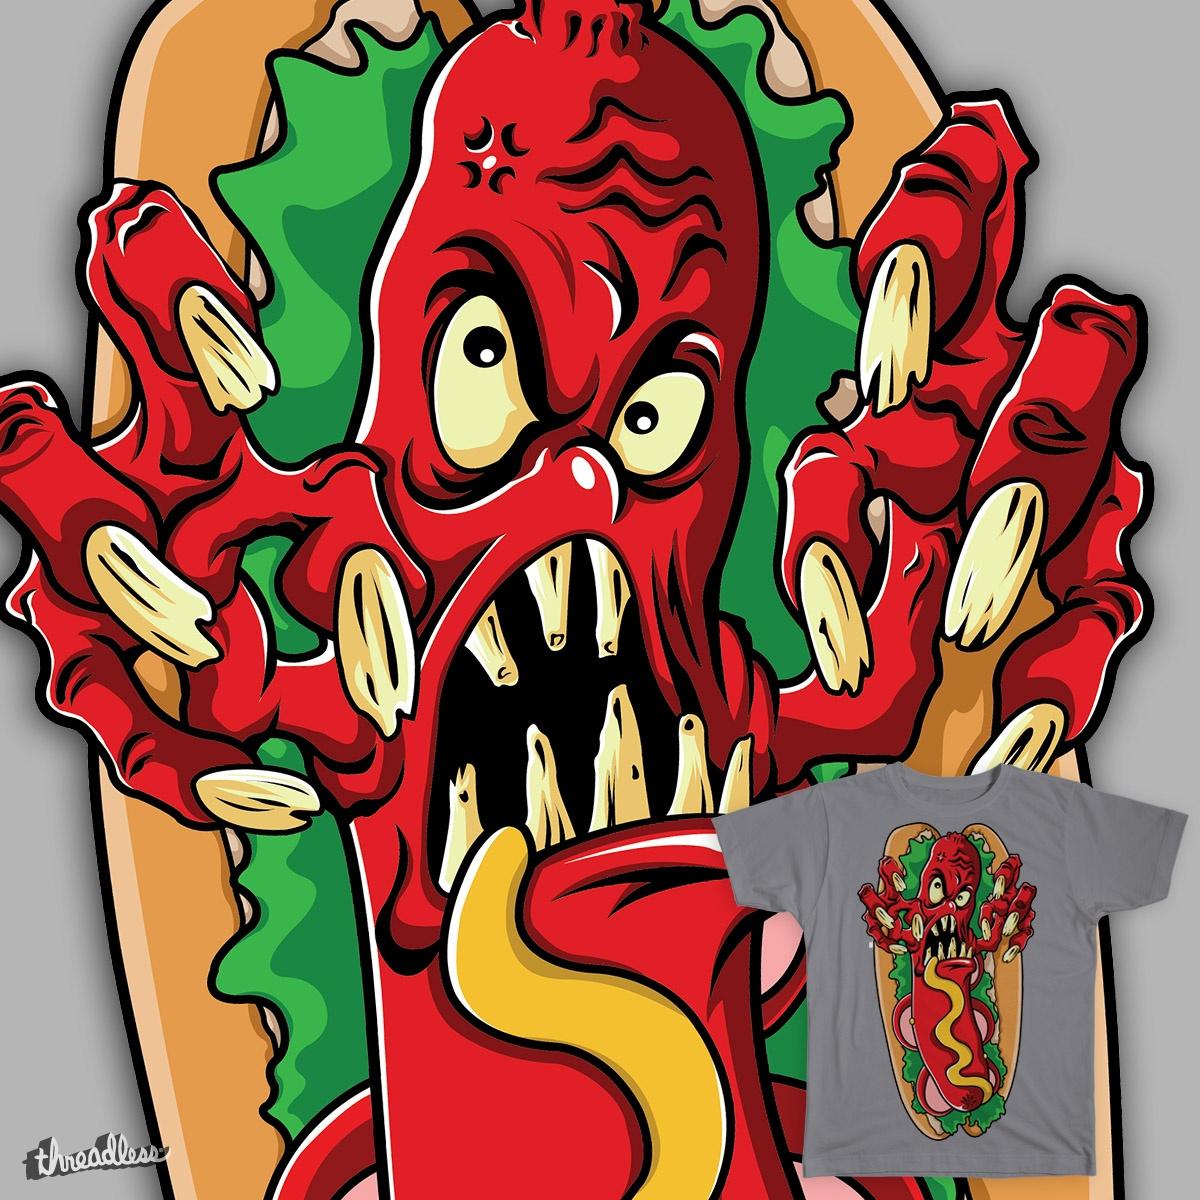 Evil HotDog by Tomrez on Threadless